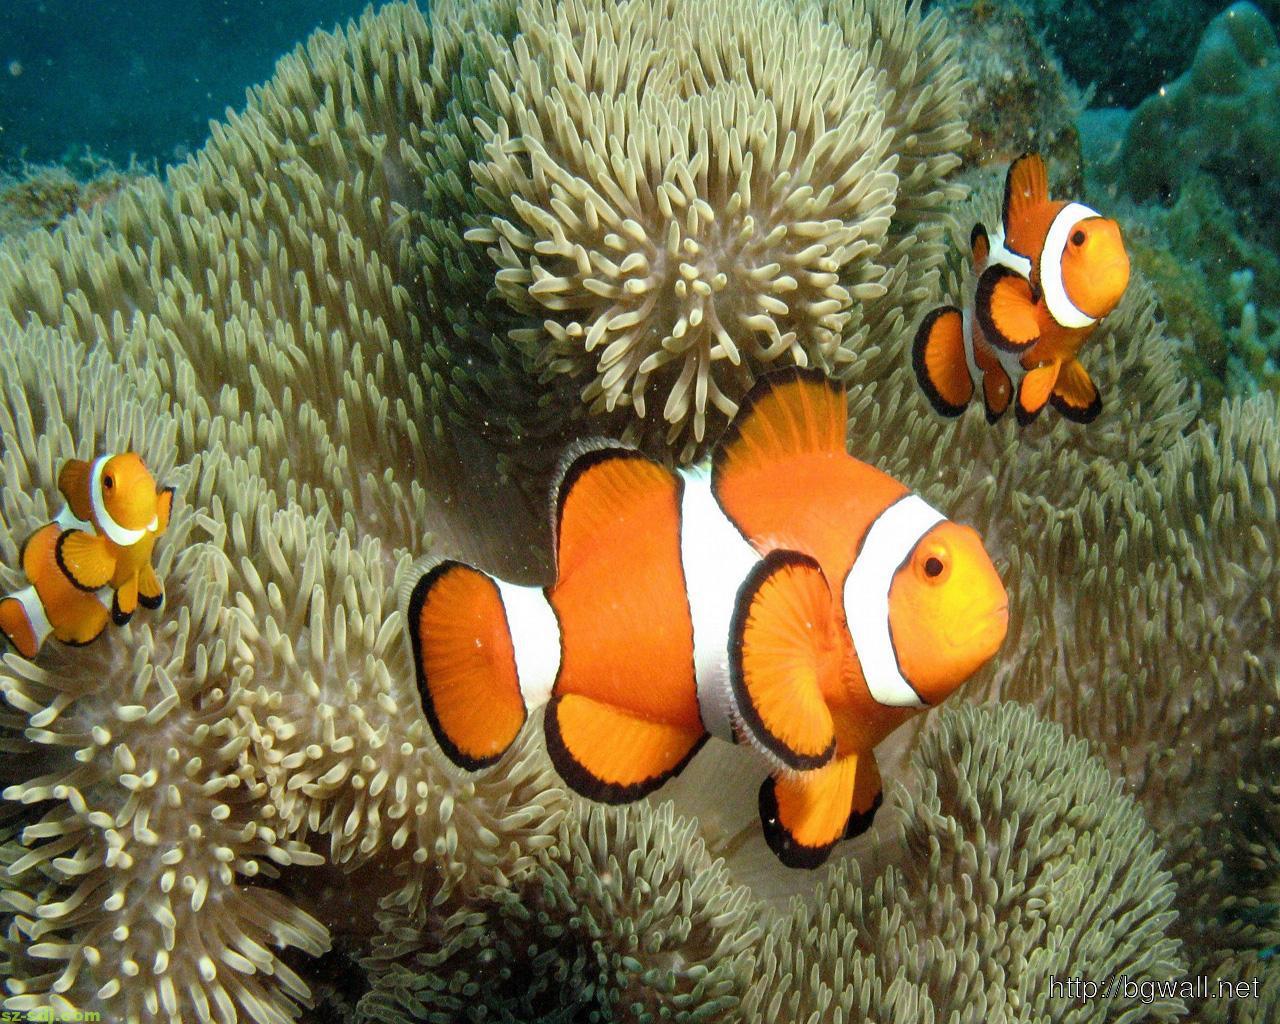 Cute Clown Fish Wallpaper Image – Background Wallpaper HD